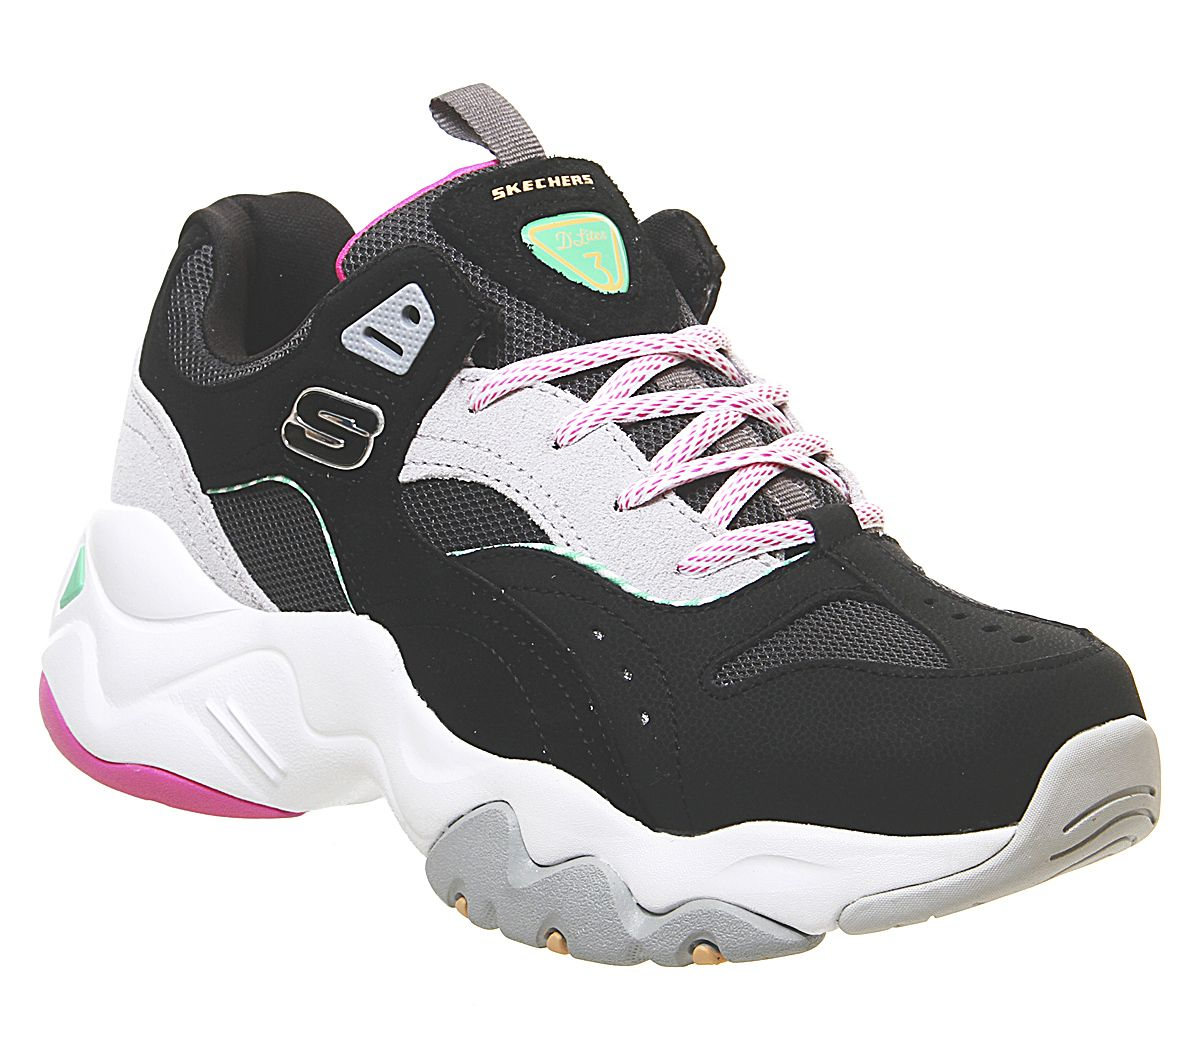 zapatos deportivos skechers ni�as gratis